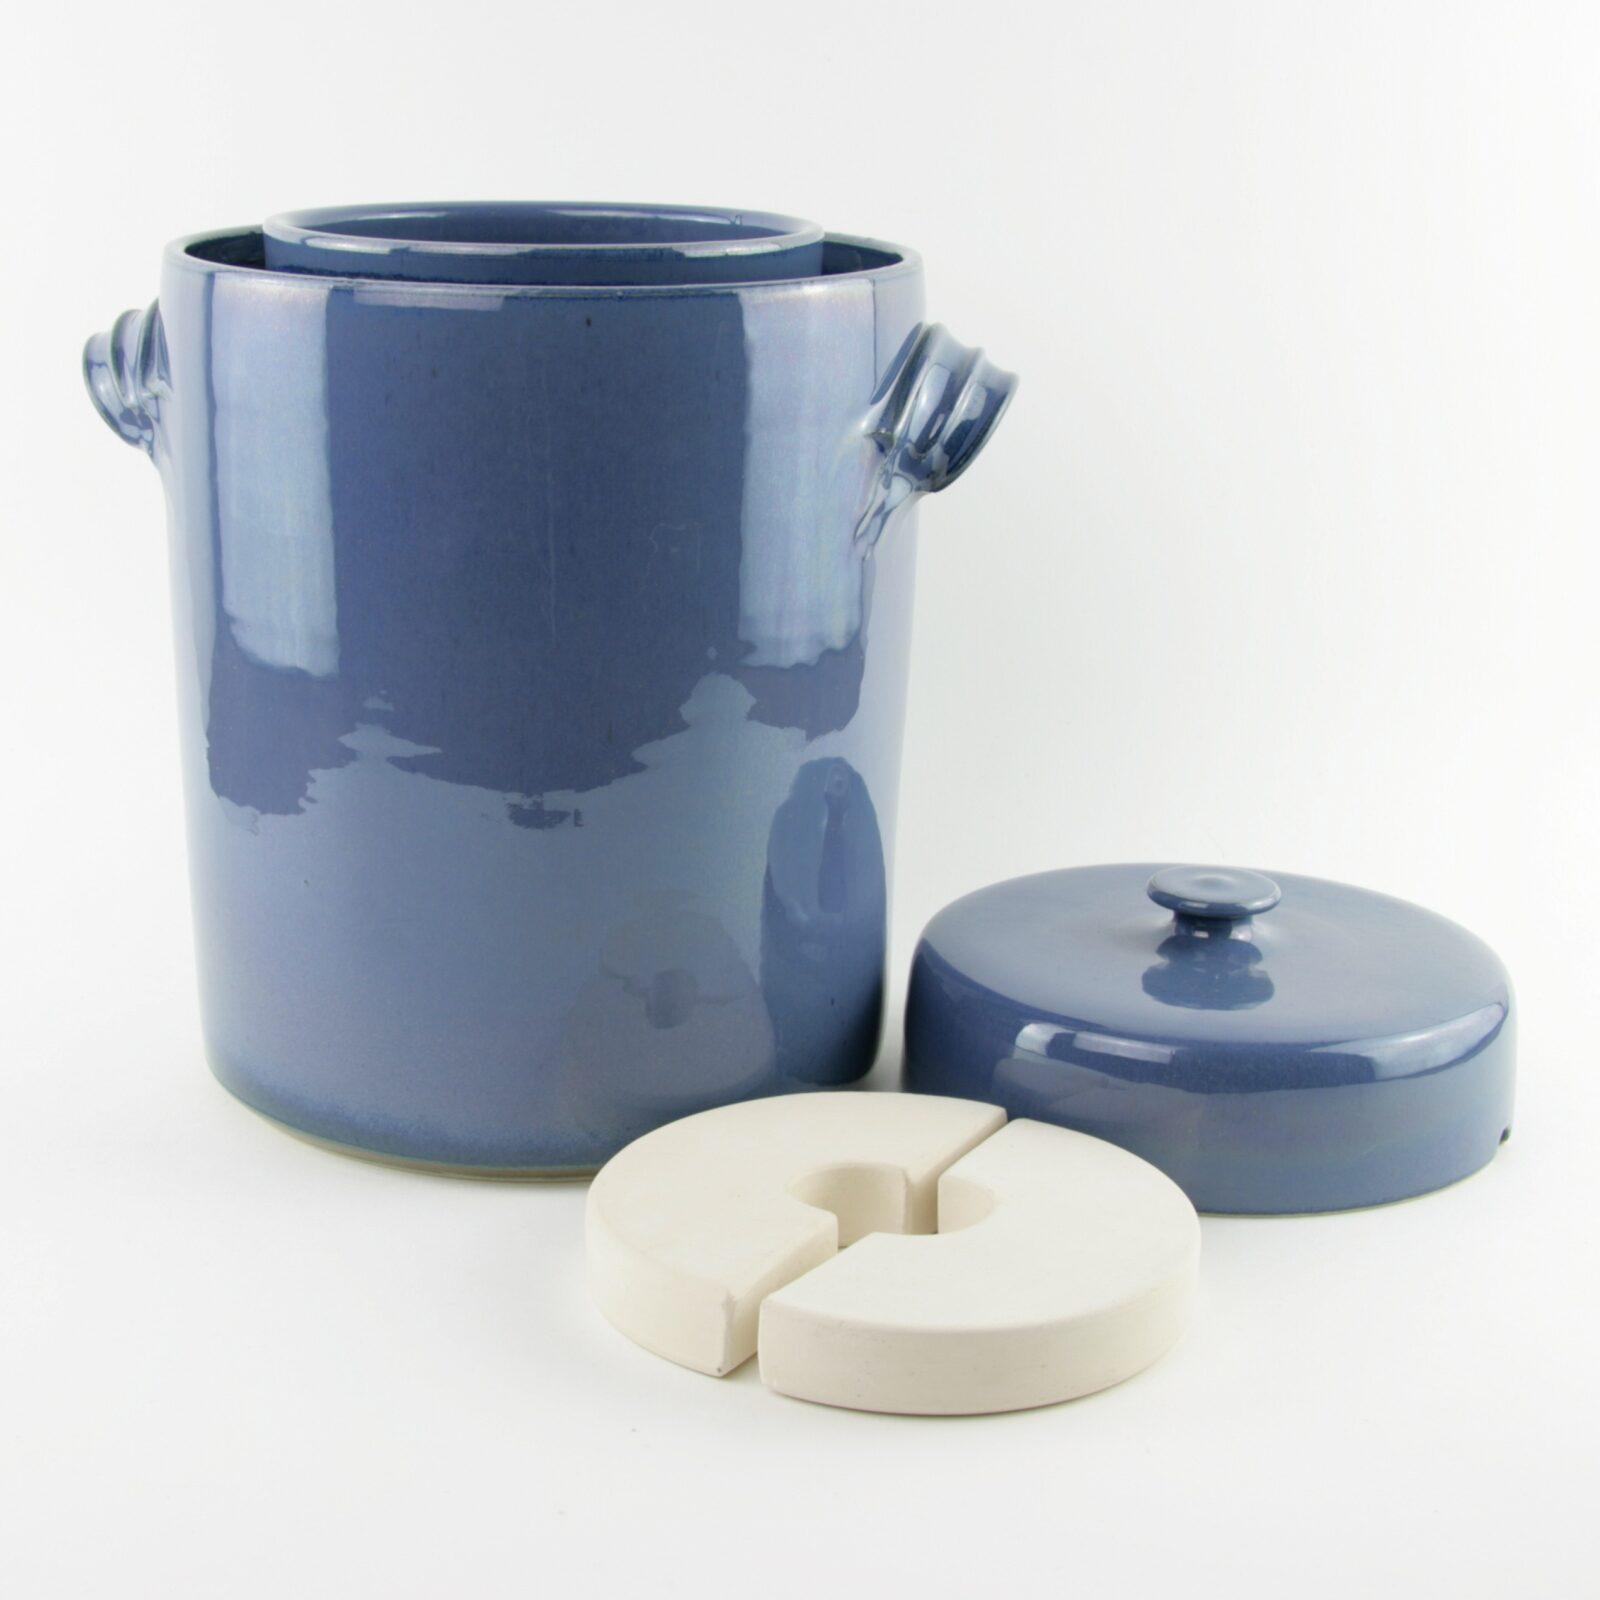 4 litre handmade ceramic sauerkraut crock in blue with weight stones